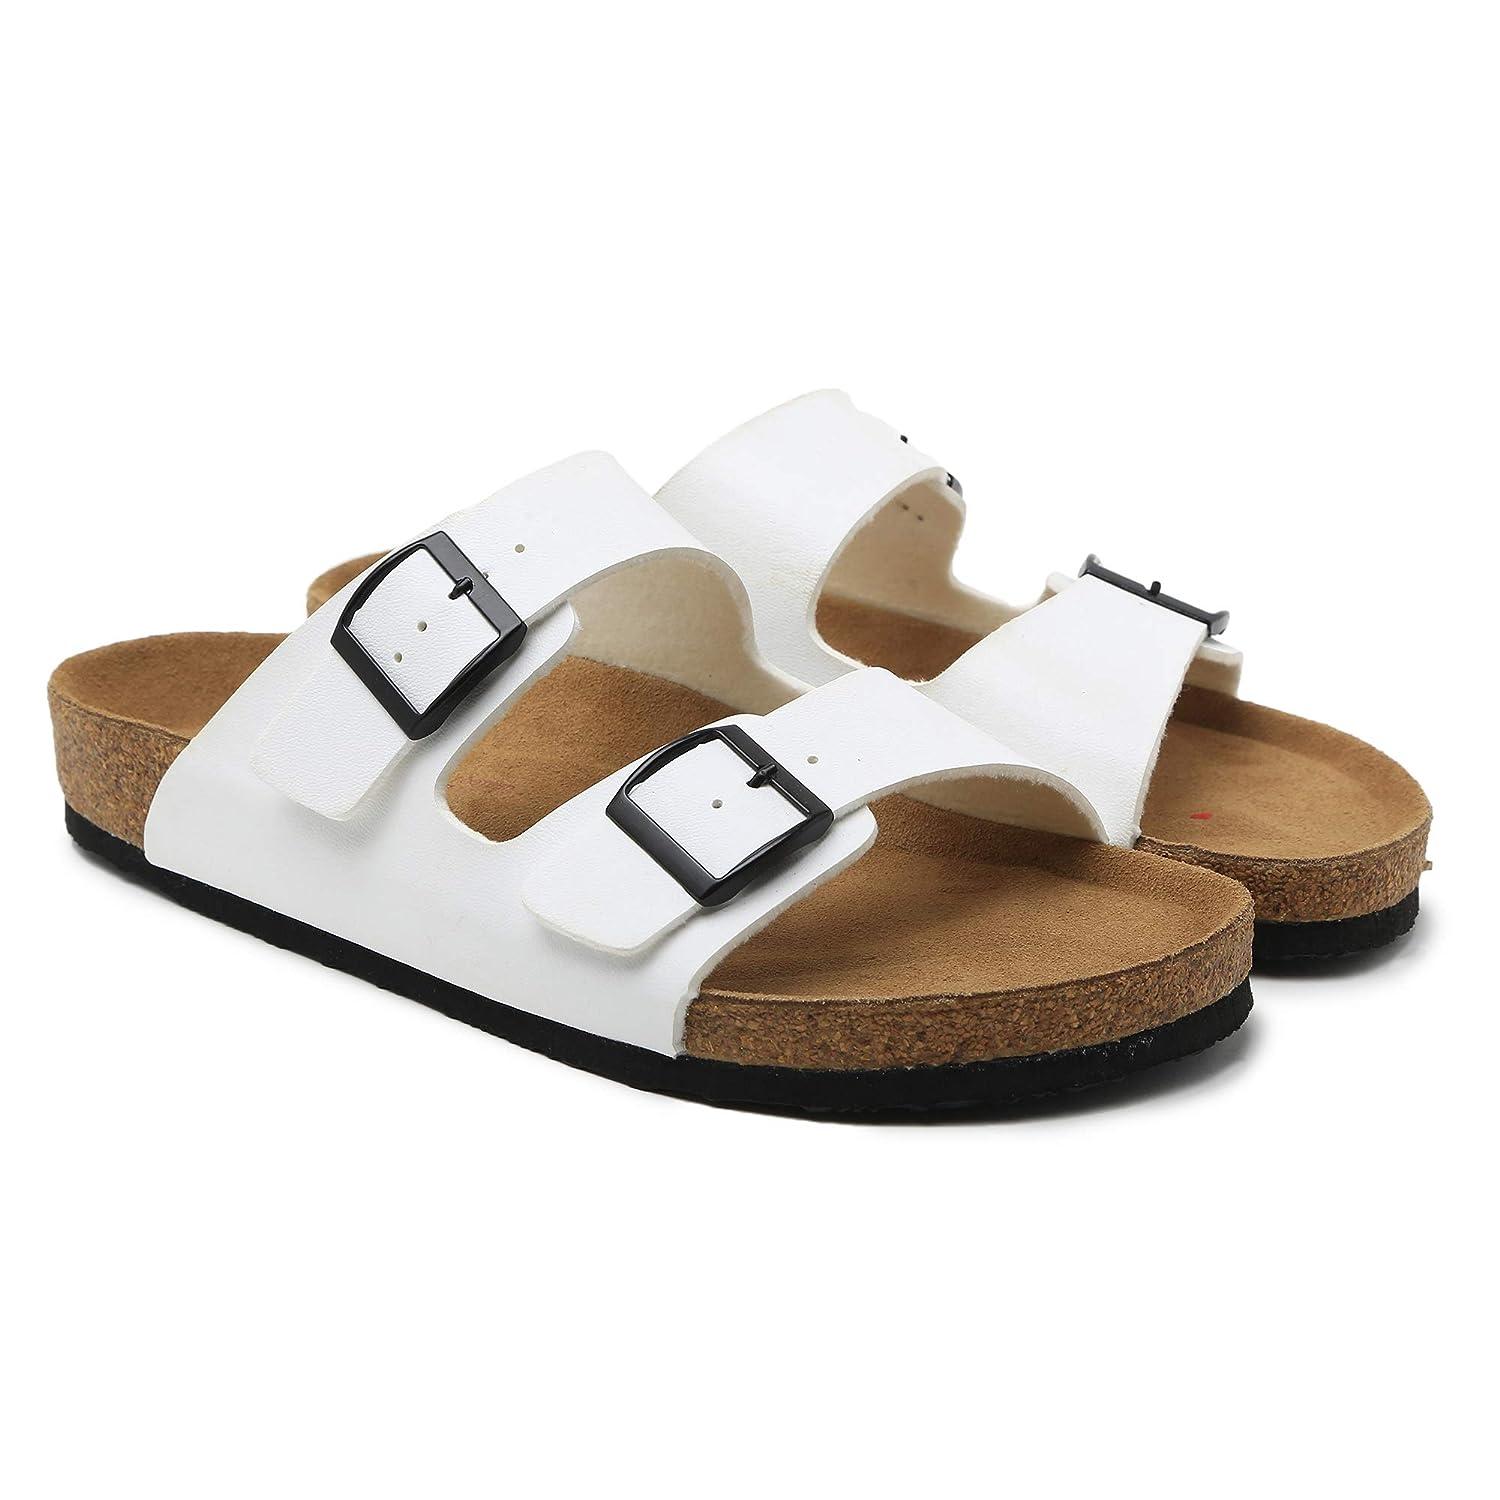 Cygna by Ruosh Men's Sandals at Amazon